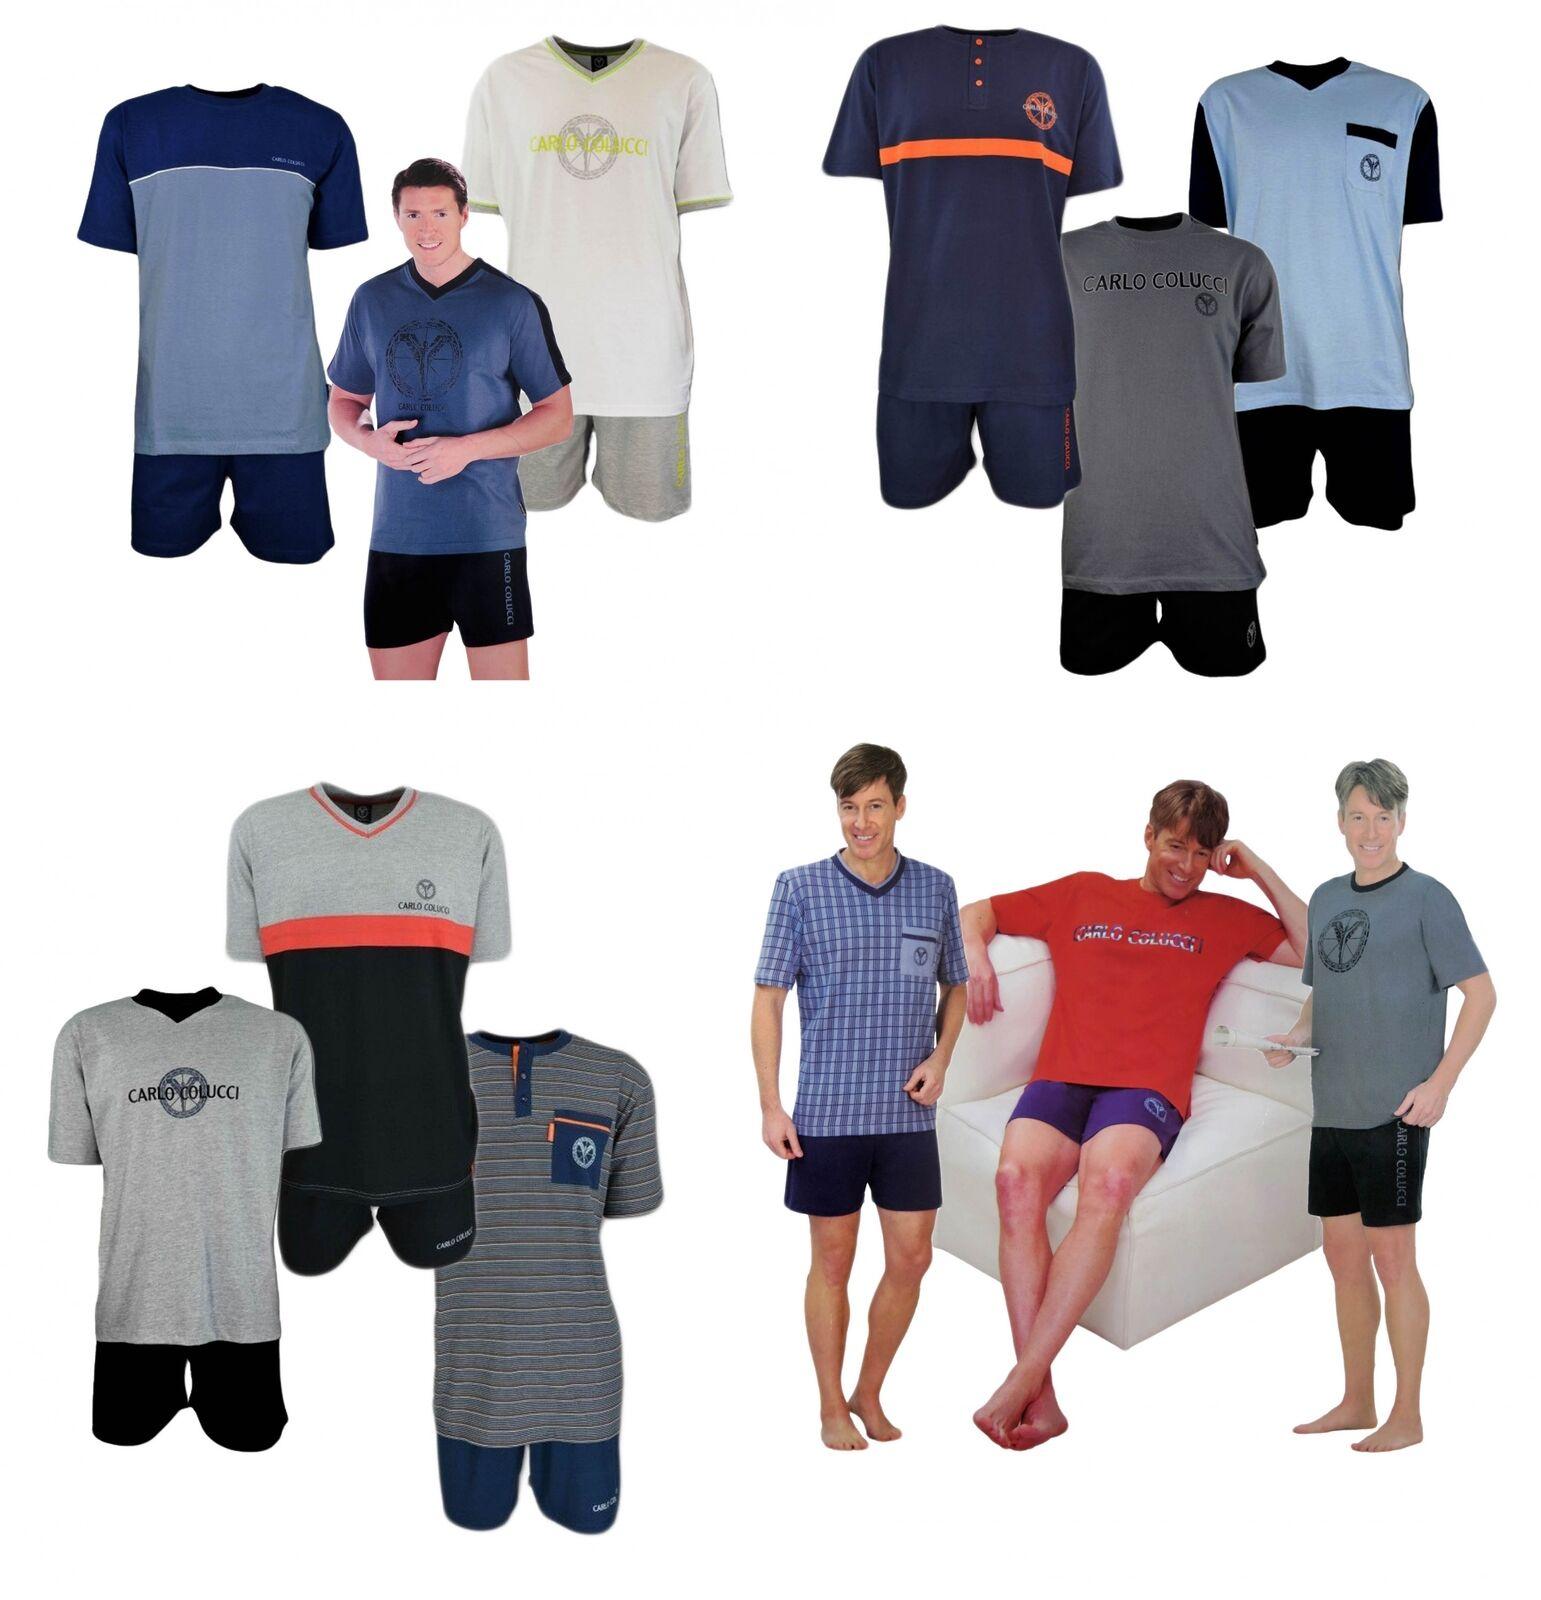 CARLO COLUCCI Herren Pyjama SHORTY Set Schlafanzug Pyjama kurz Nachtwäsche